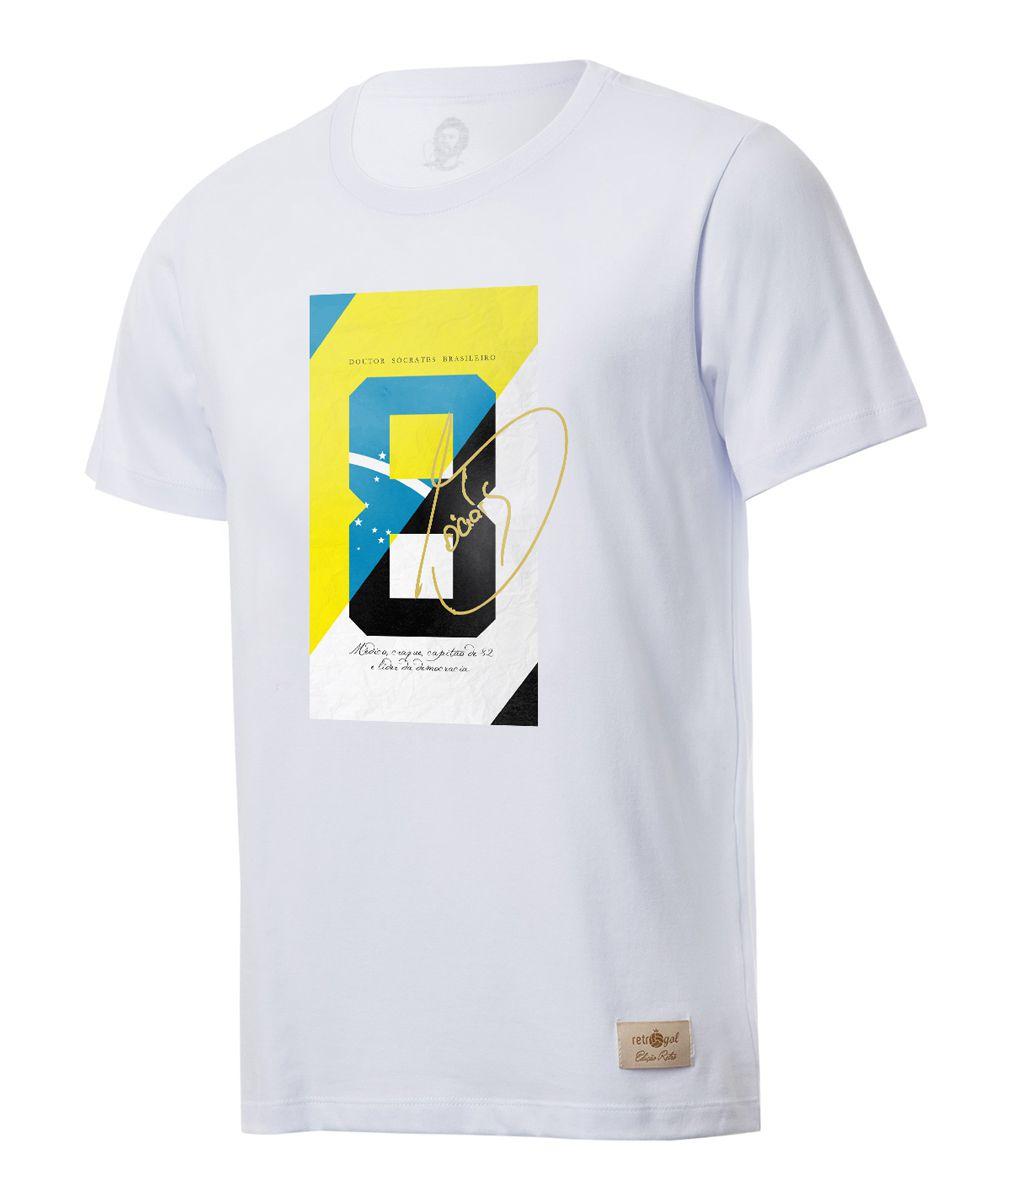 Camisa Casual Retrô Gol Sócrates Ex - Corinthians 8